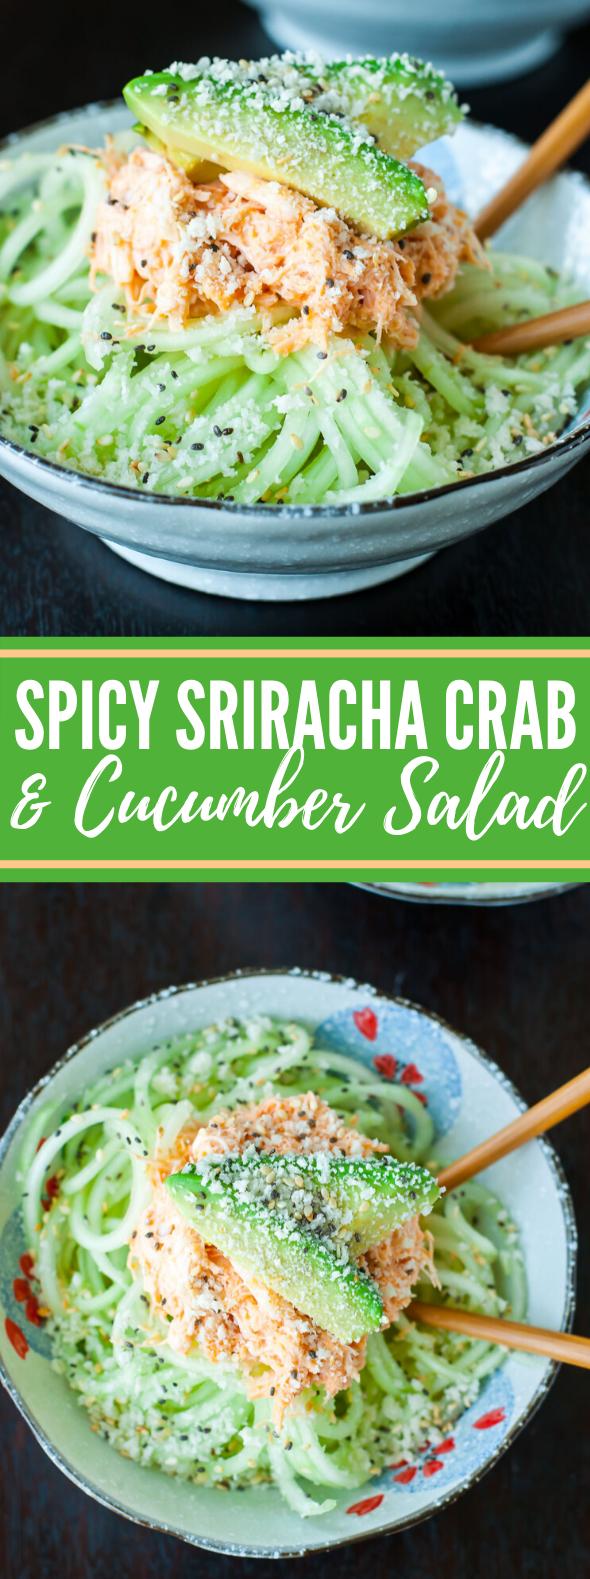 SPICY SRIRACHA CRAB AND CUCUMBER SALAD #vegetarian #appetizers #salad #noodles #cucumber